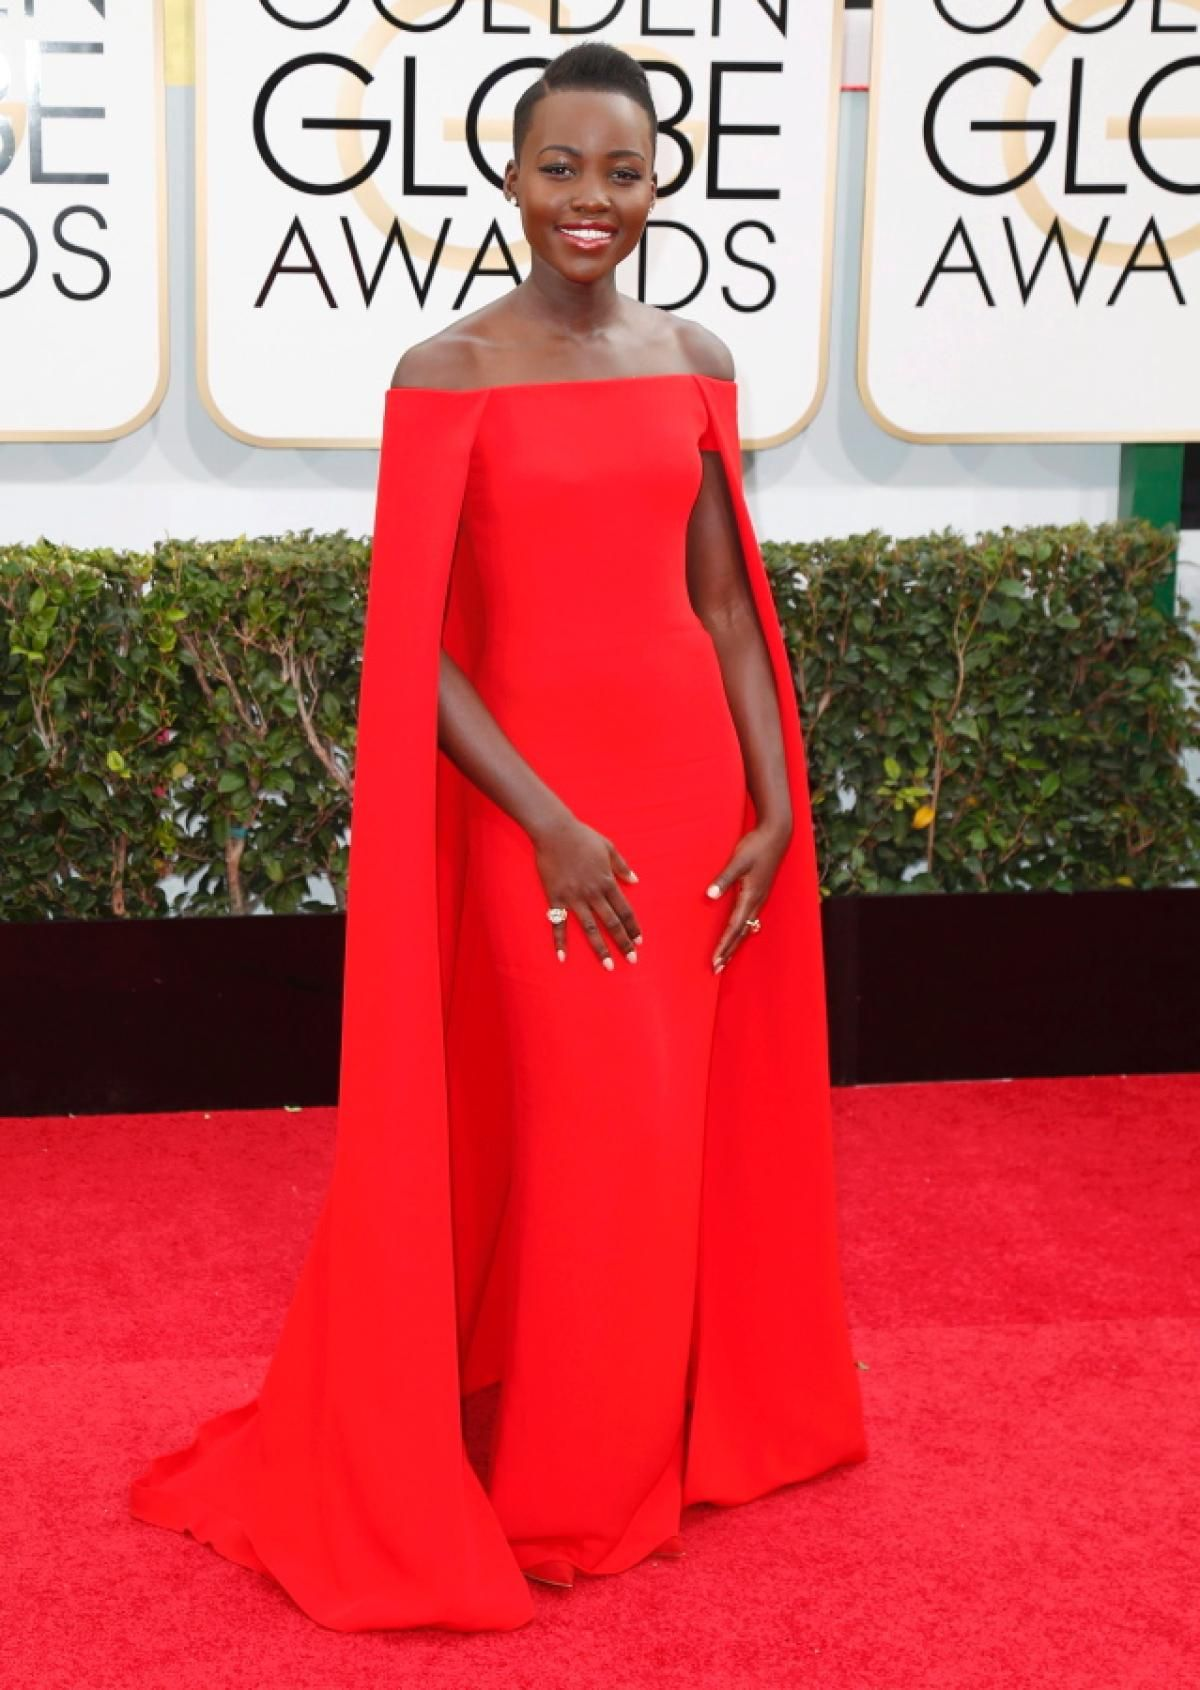 Golden Globes: i migliori look di tutti i tempi